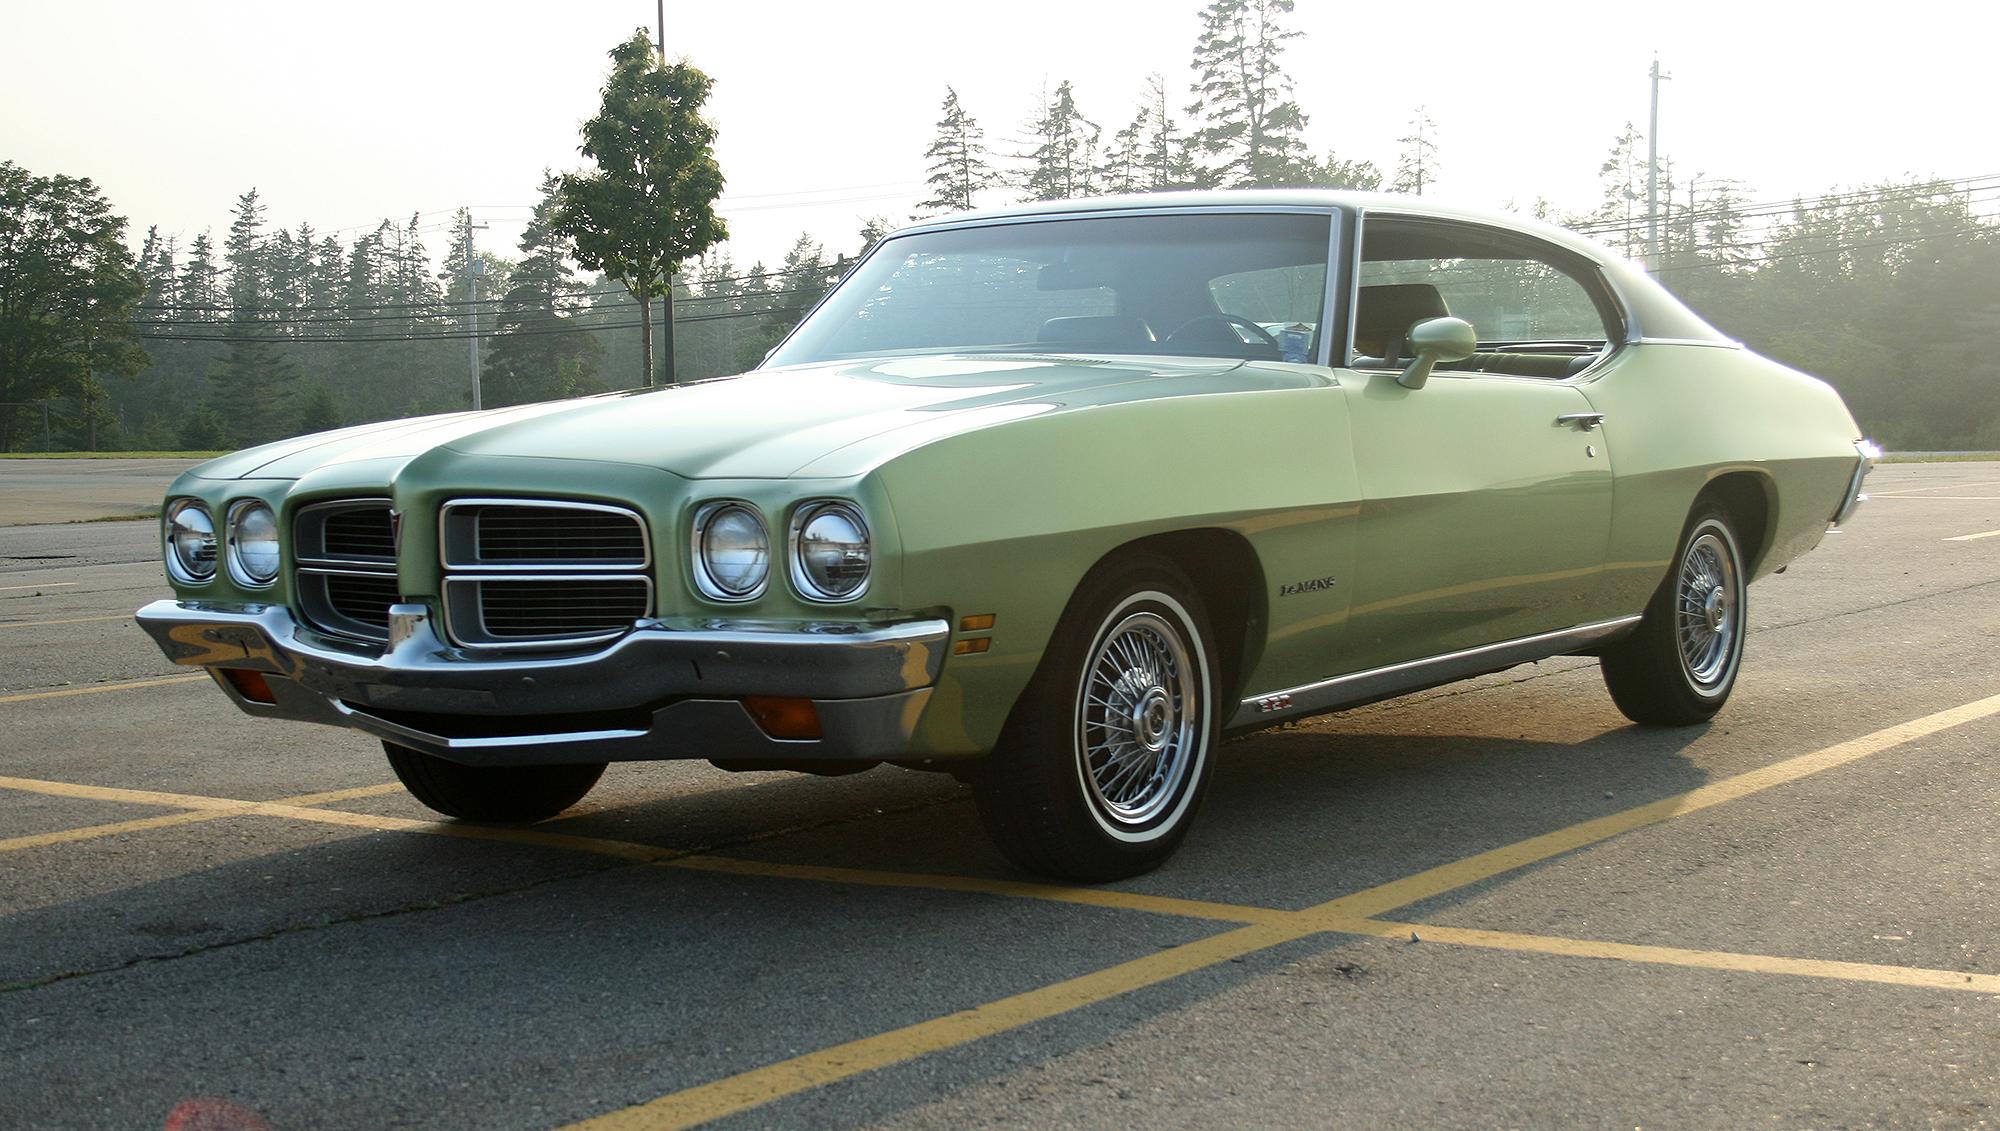 File:1972 Pontiac Lemans Front.JPG - Wikimedia Commons